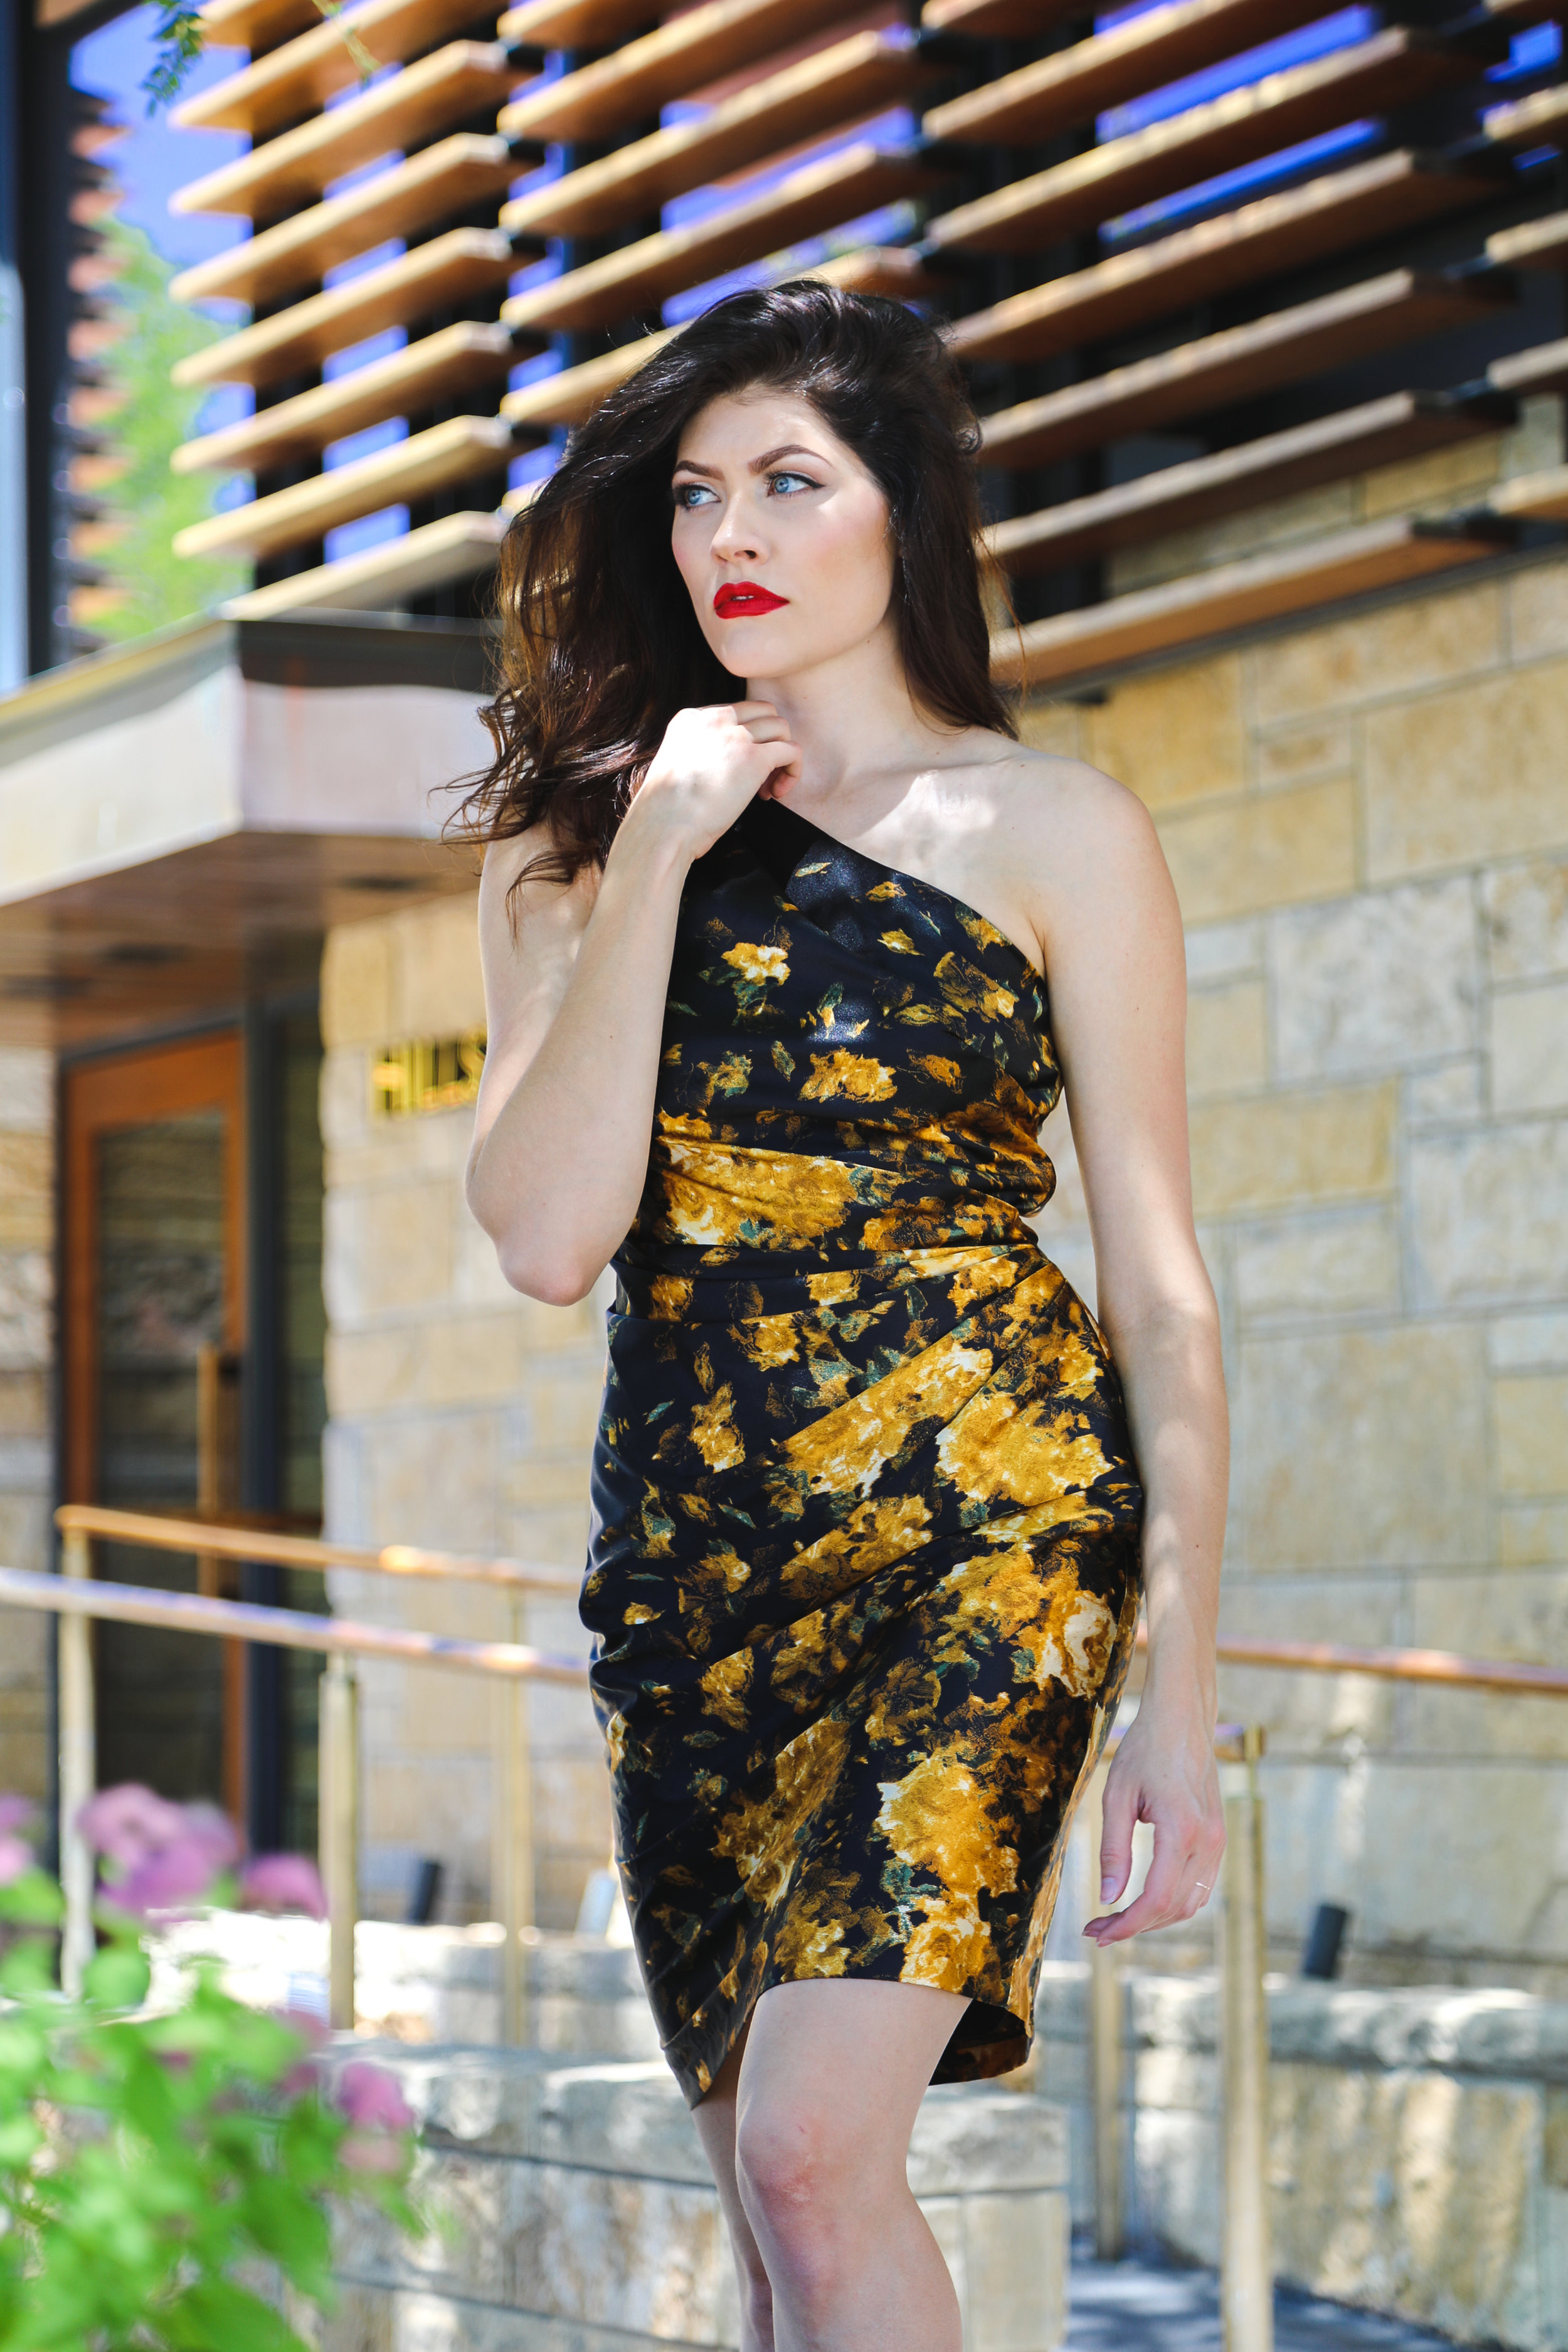 - Get the Look Now at the Cherry Creek North Sidewalk SaleJuly 18th - 21stDress: Kouture ConsignmentCherryCreekNorth.com/Sidewalksale